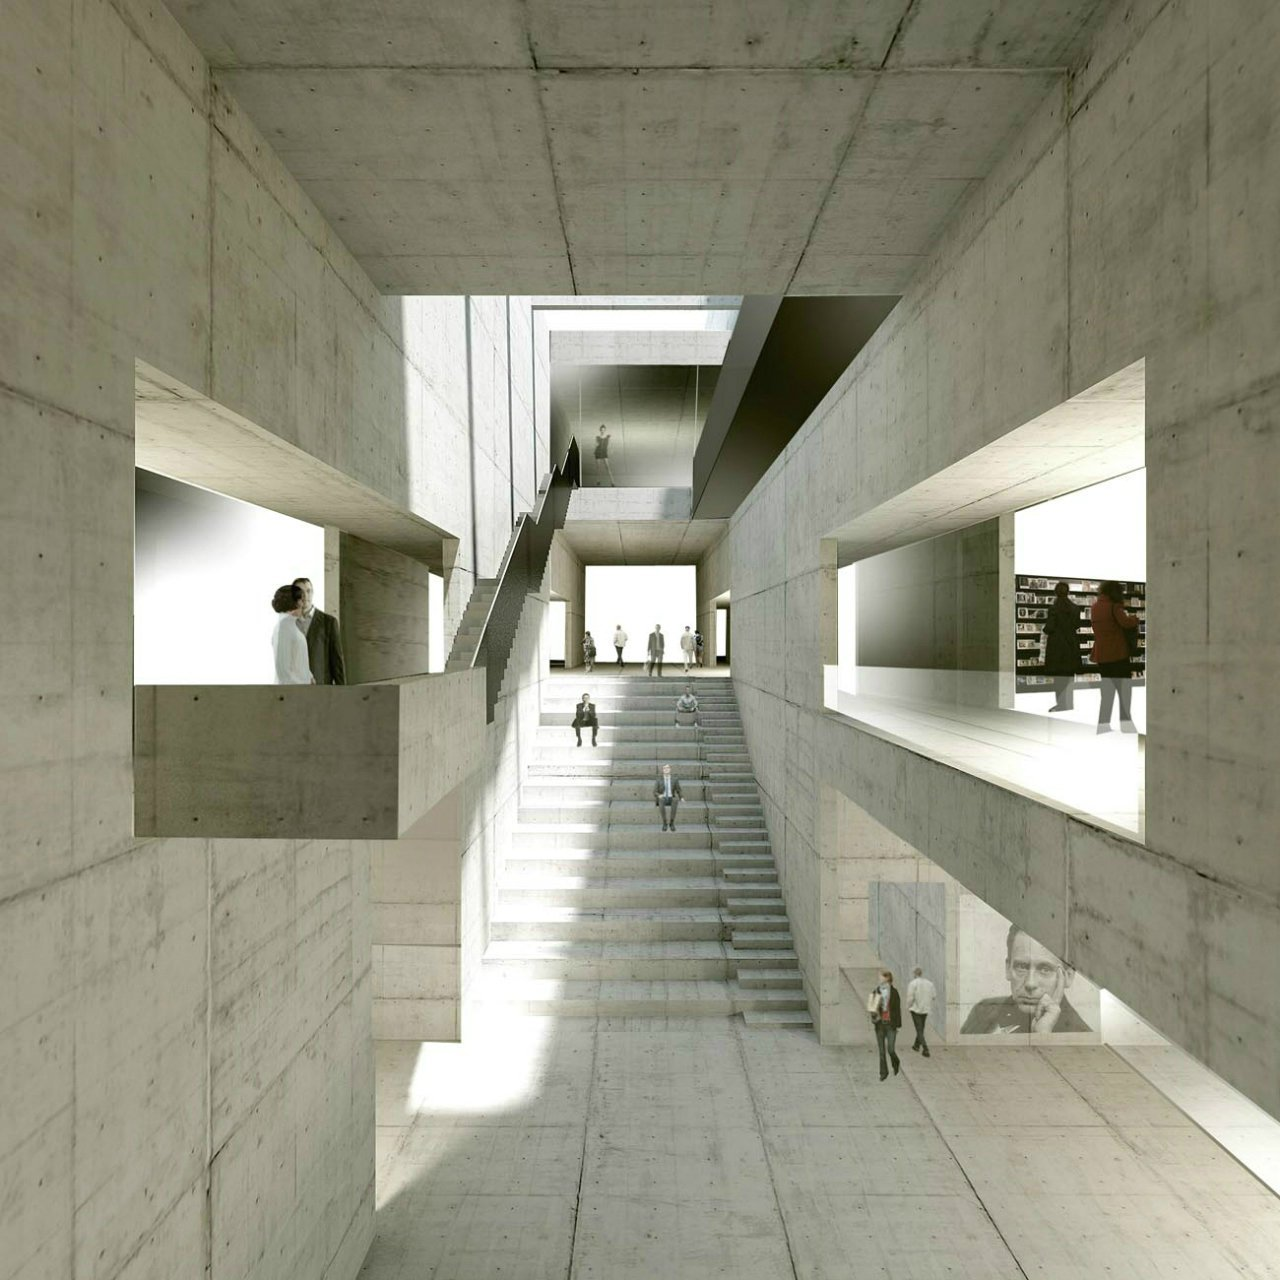 gallery of new bauhaus museum architekten hrk 2. Black Bedroom Furniture Sets. Home Design Ideas